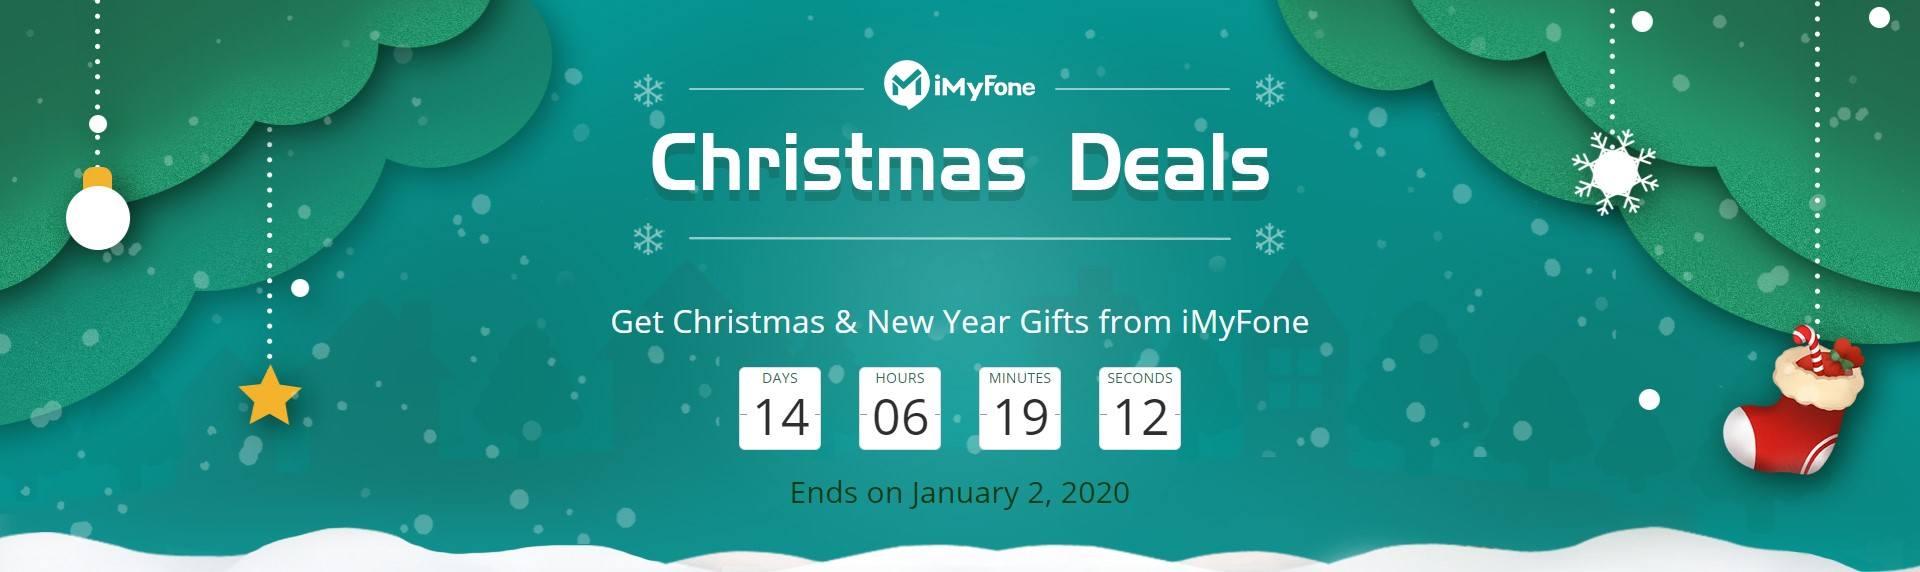 iMyFone offerta di Natale 2019